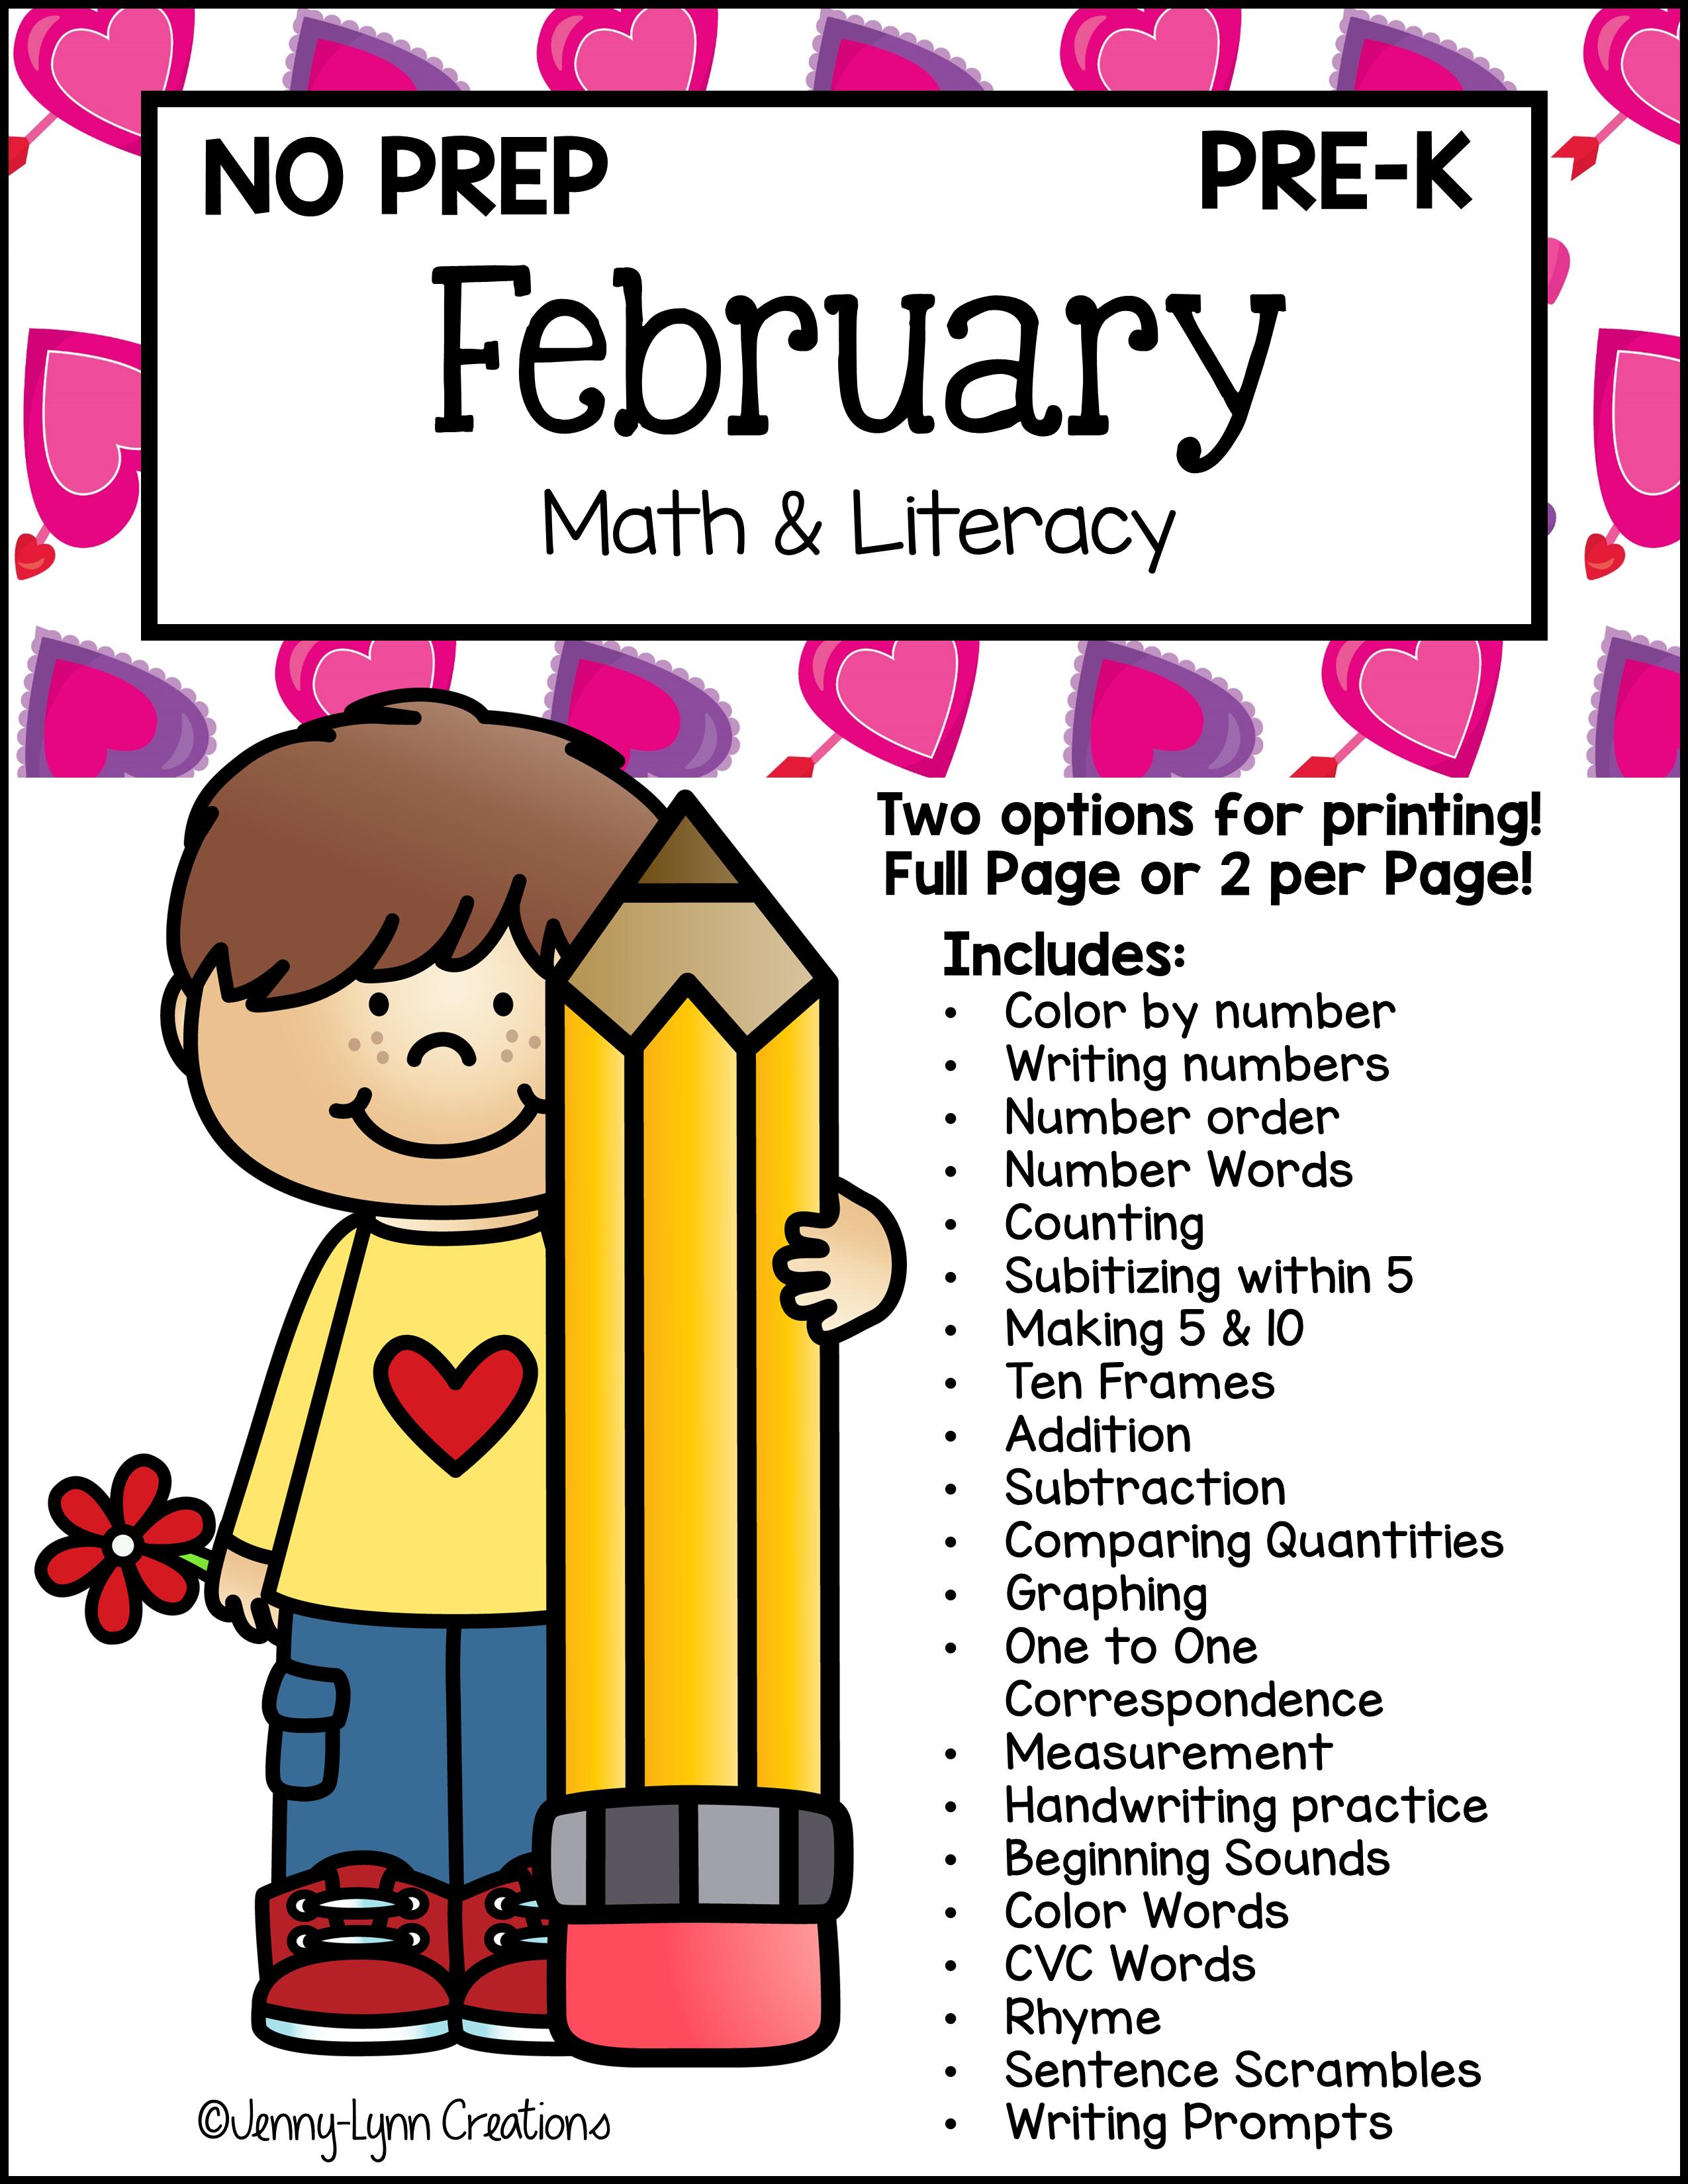 Preschool February Math and Literacy Workbook - Printable PDF